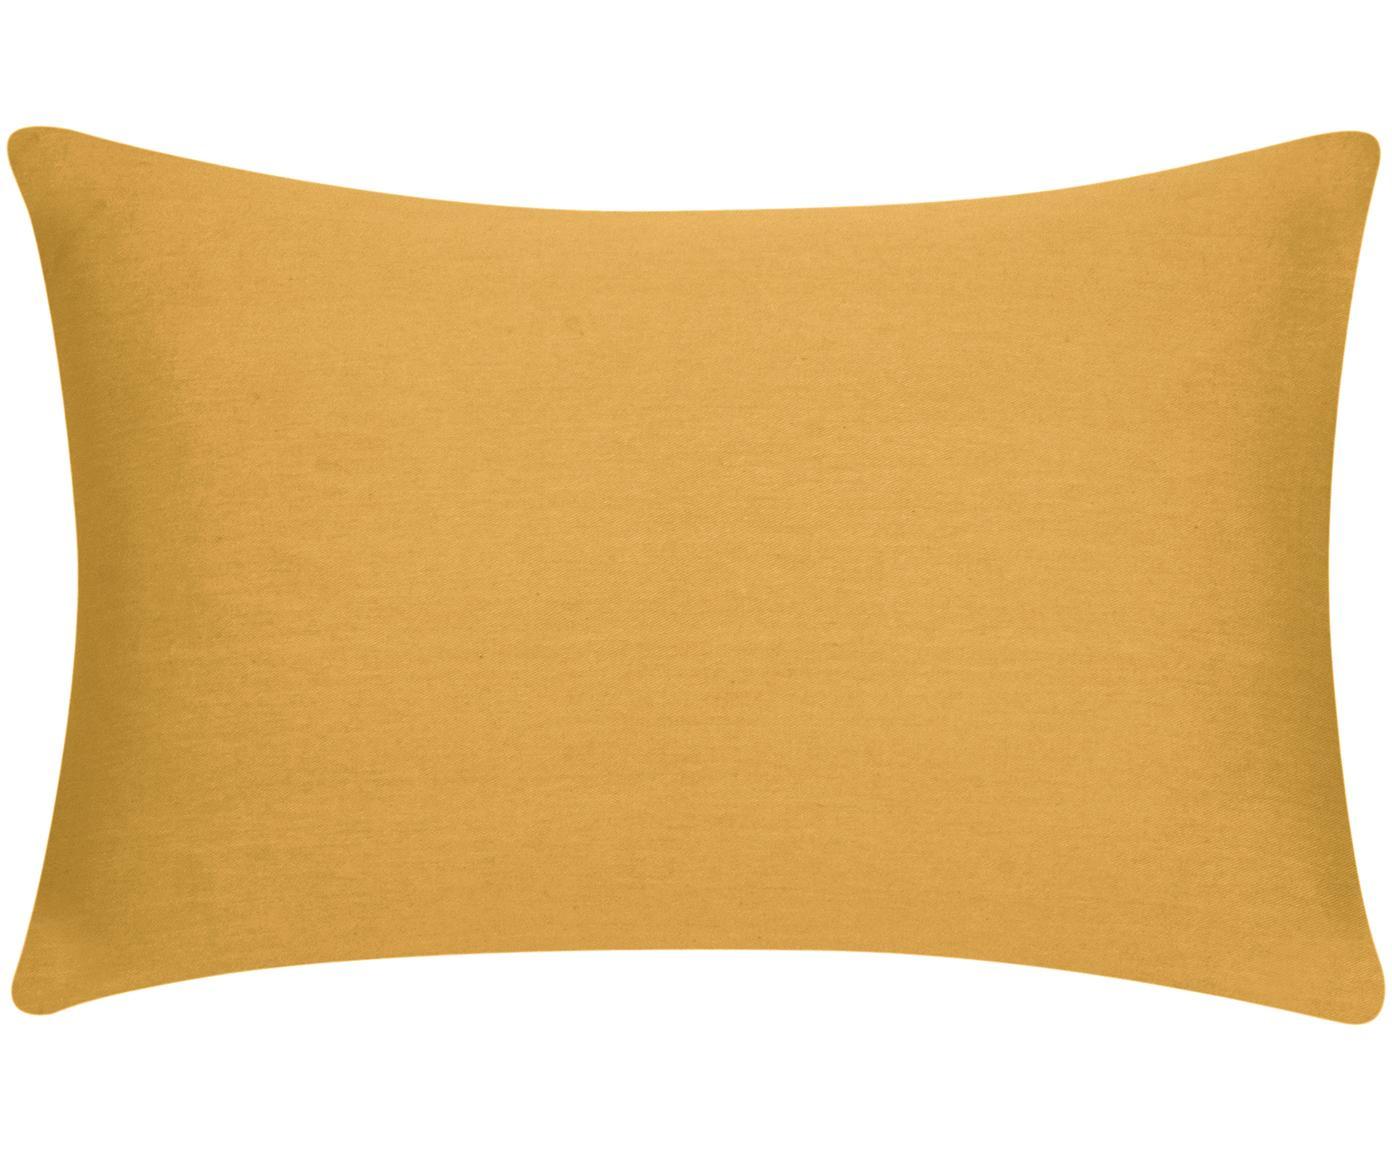 Funda de cojín de algodón Mads, Algodón, Mostaza, An 30 x L 50 cm